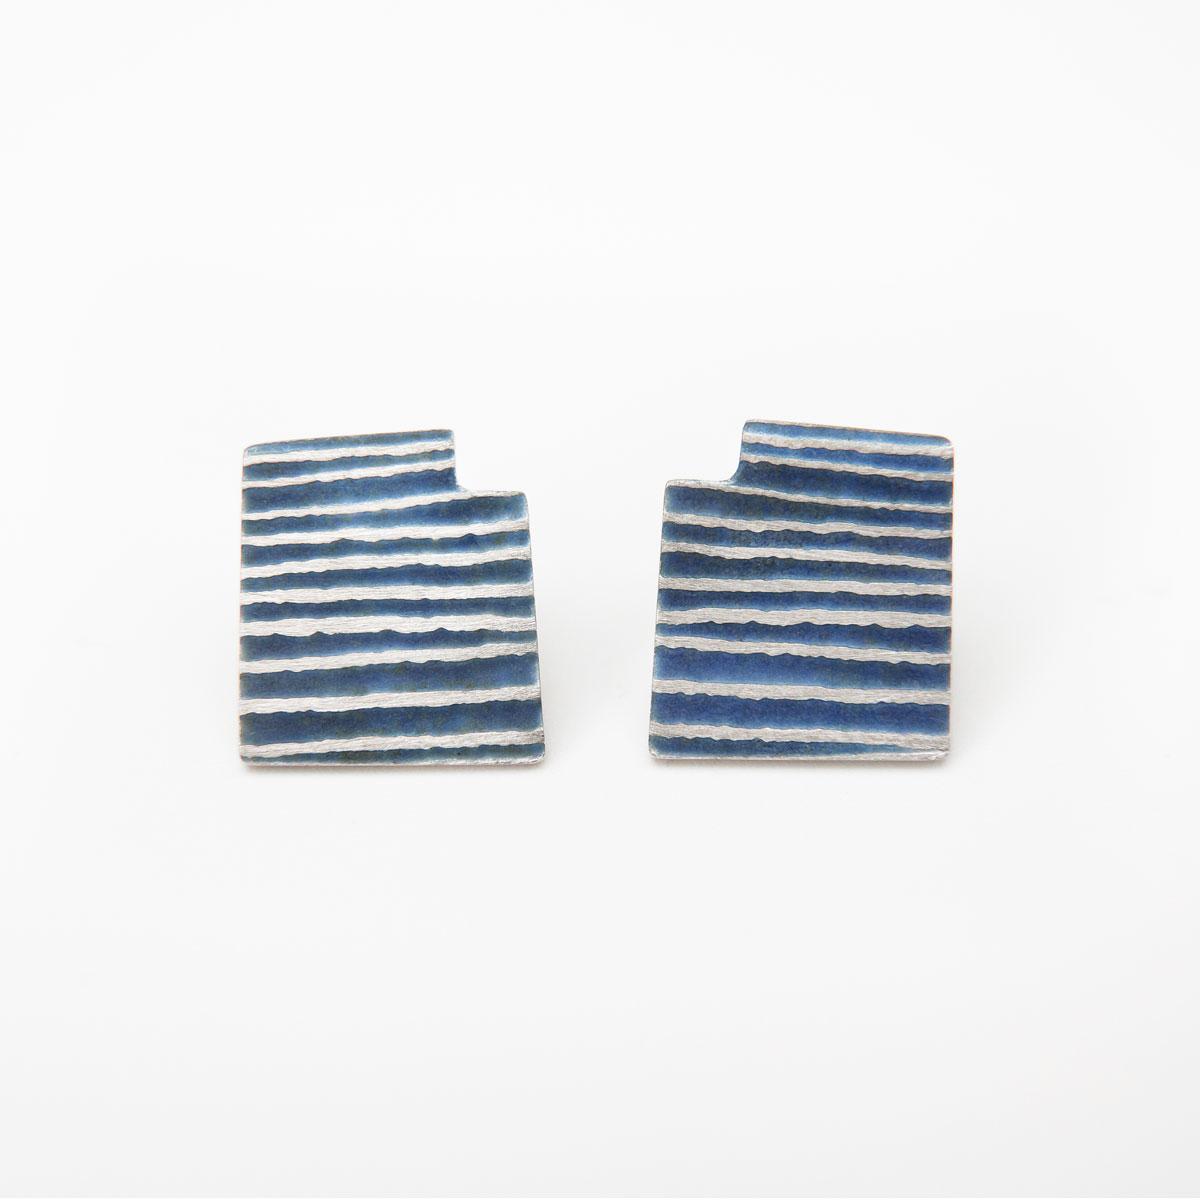 'Lines in Motion' Blue-Grey Stud Earrings